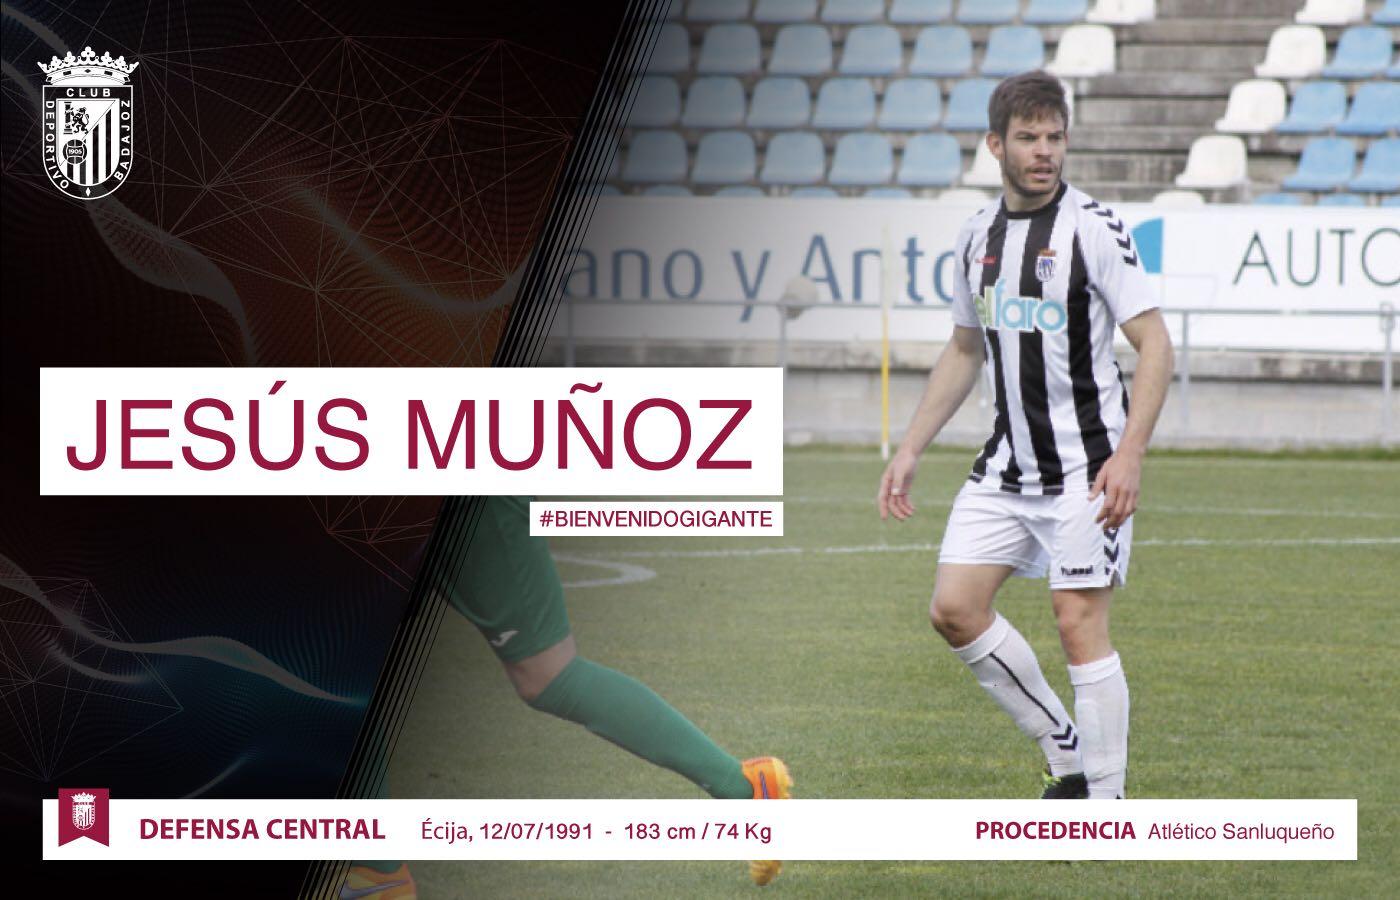 Jesús Muñoz CD Badajoz